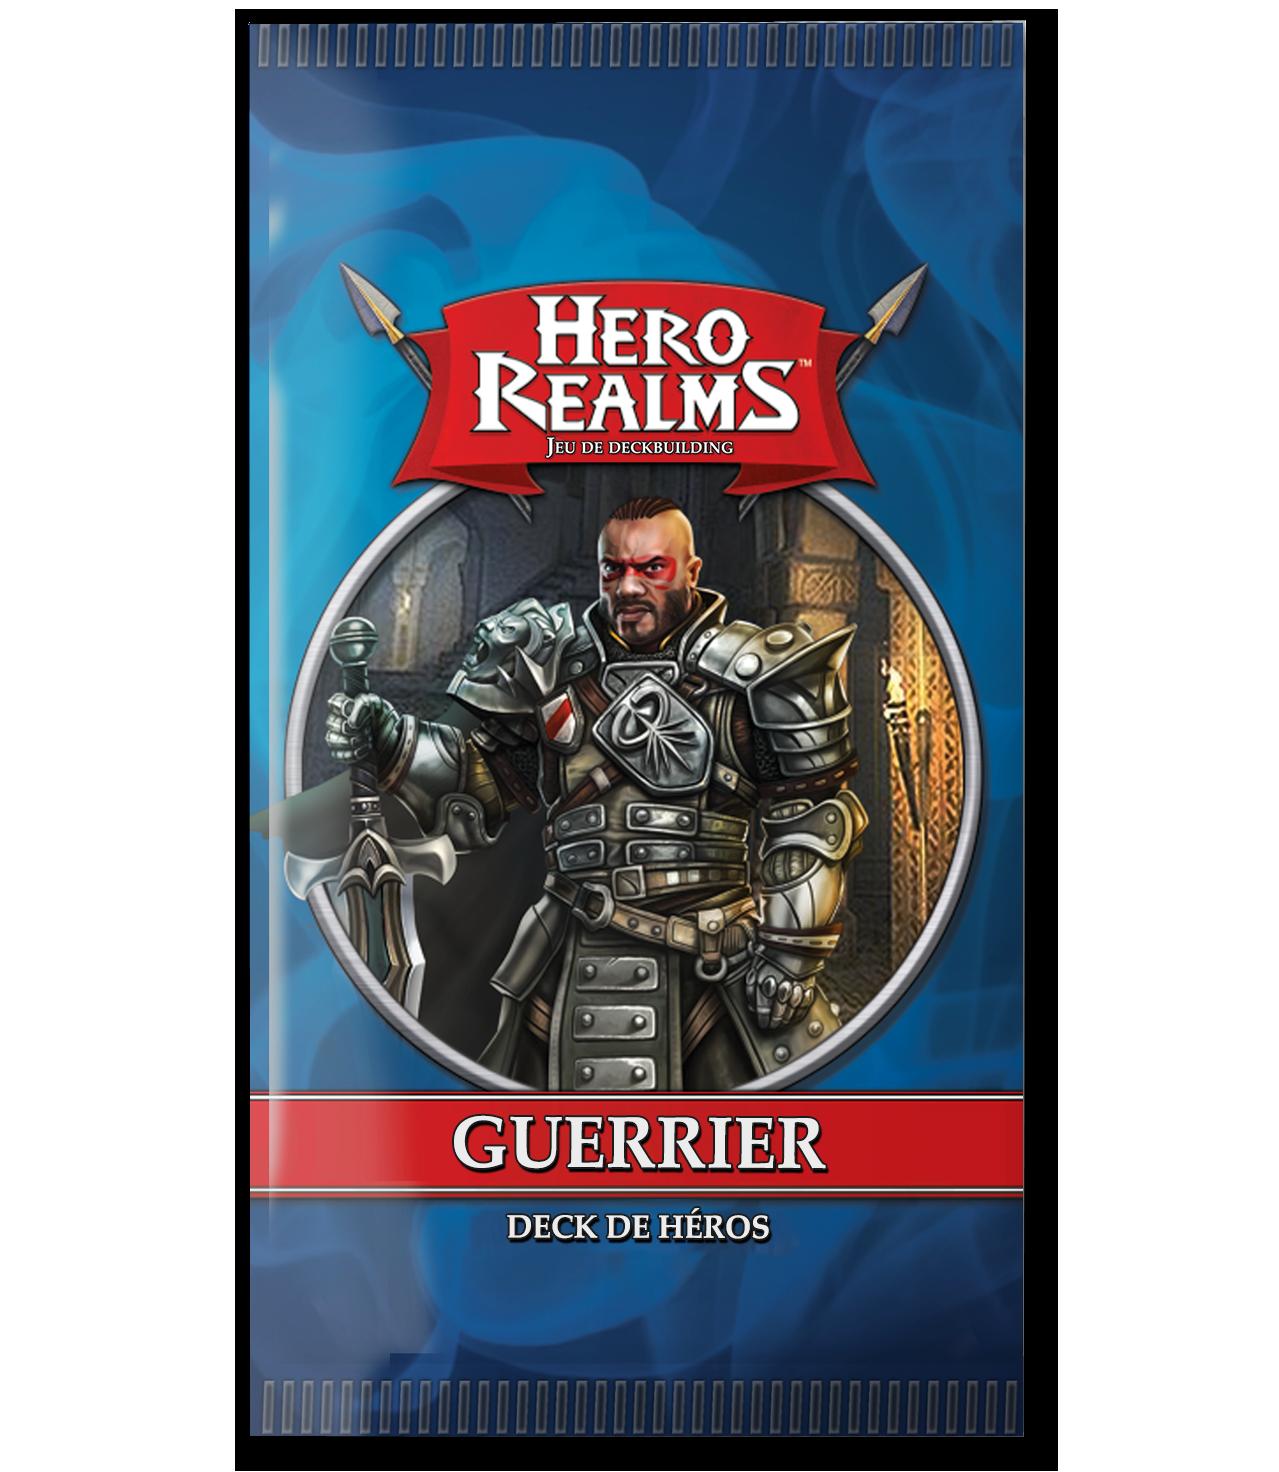 Hero Realms - Deck de héros guerrier